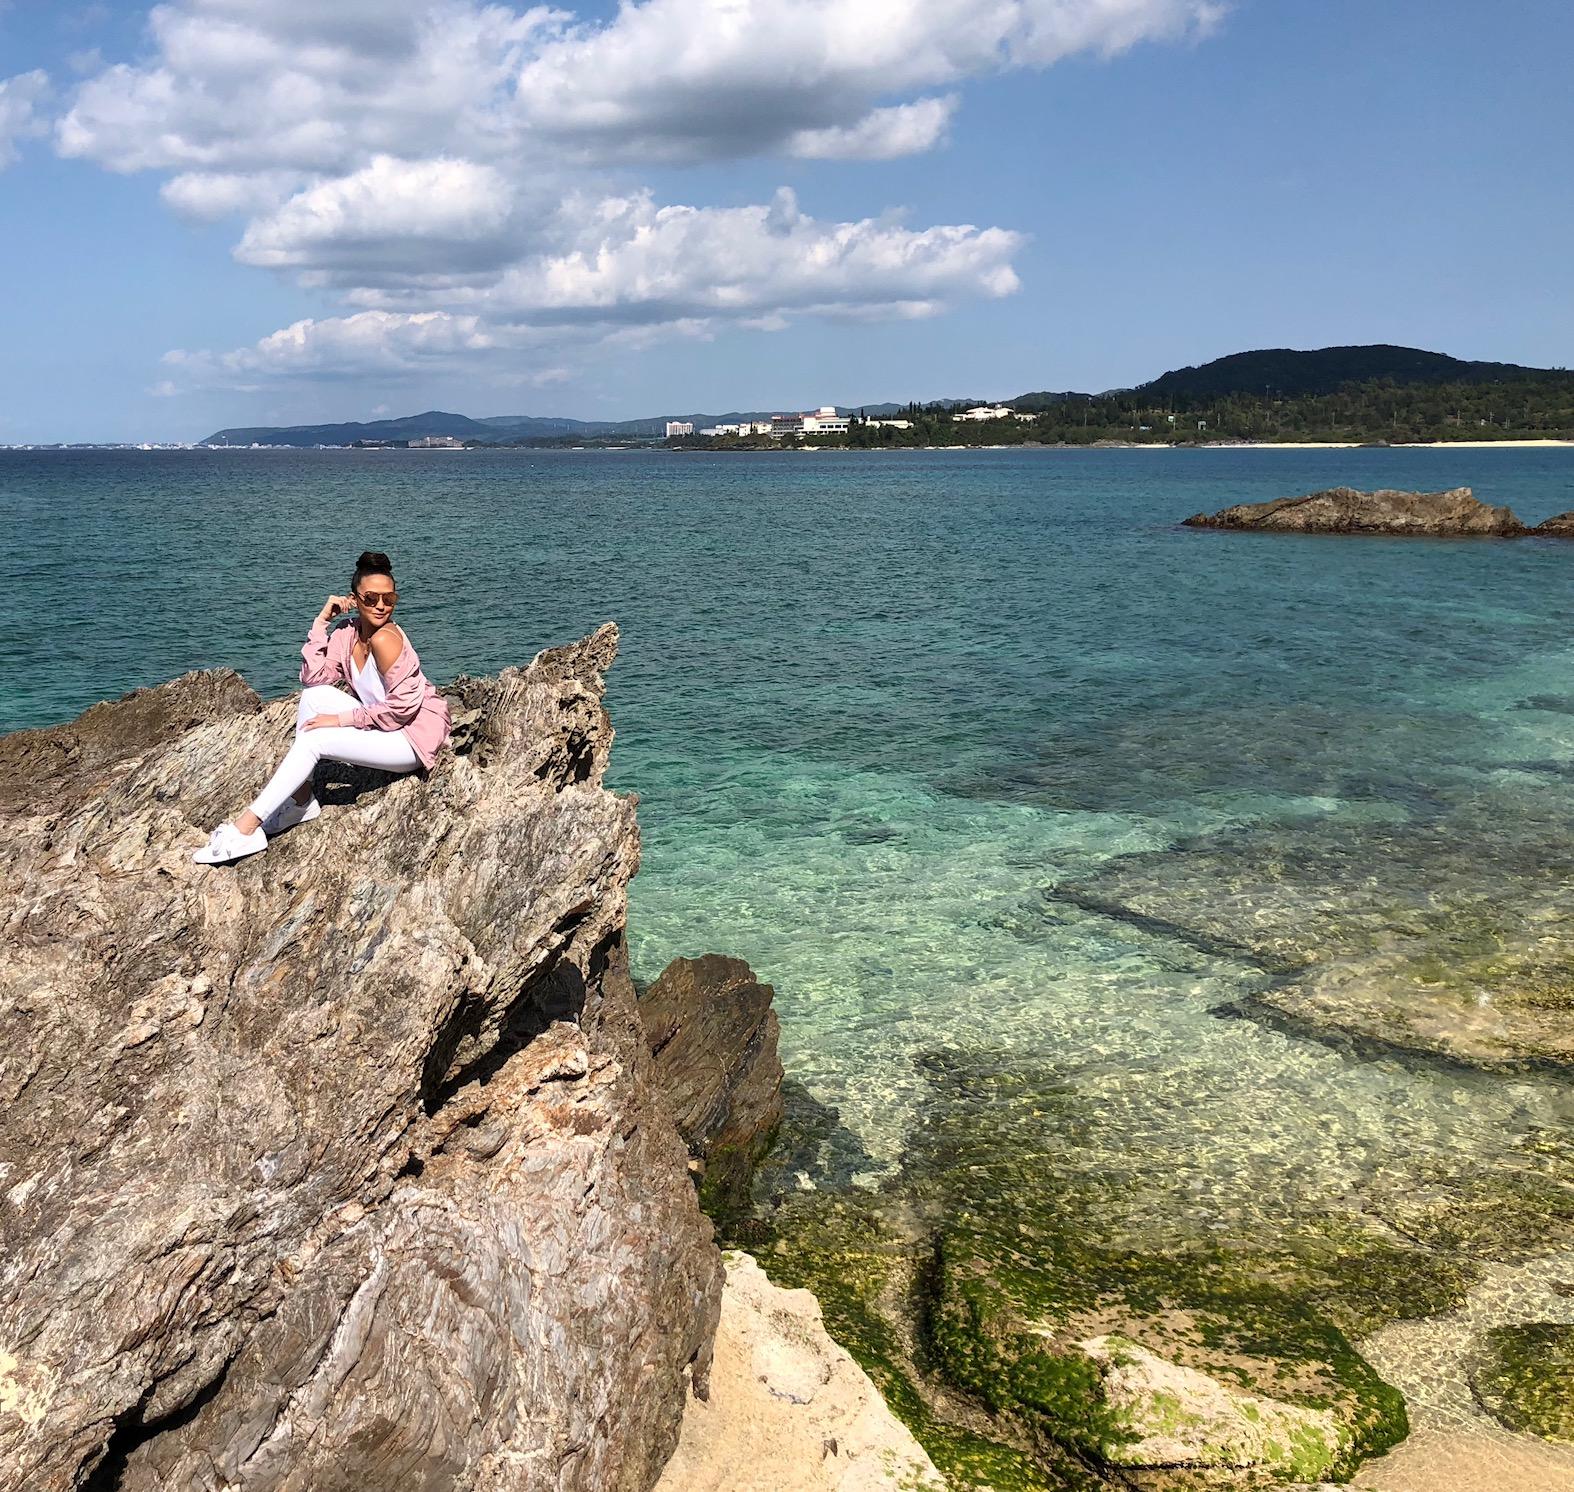 [EXCLUSIVE] Cesca Litton Explores Okinawa